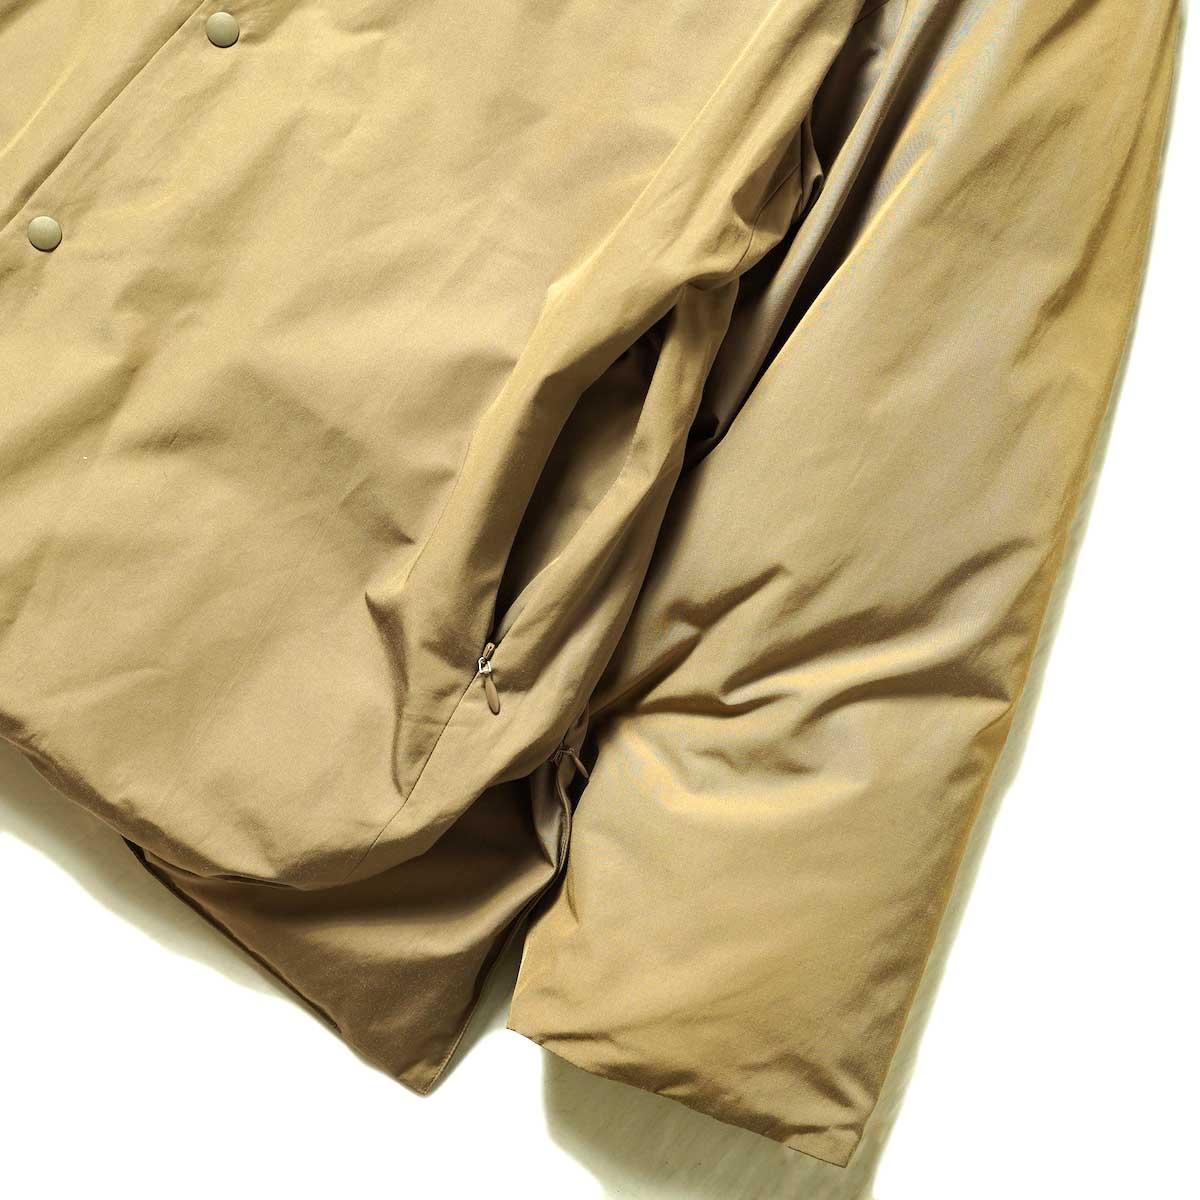 blurhms / Stand-up Collar Down Jacket (Khaki Beige) 袖・裾・ポケット